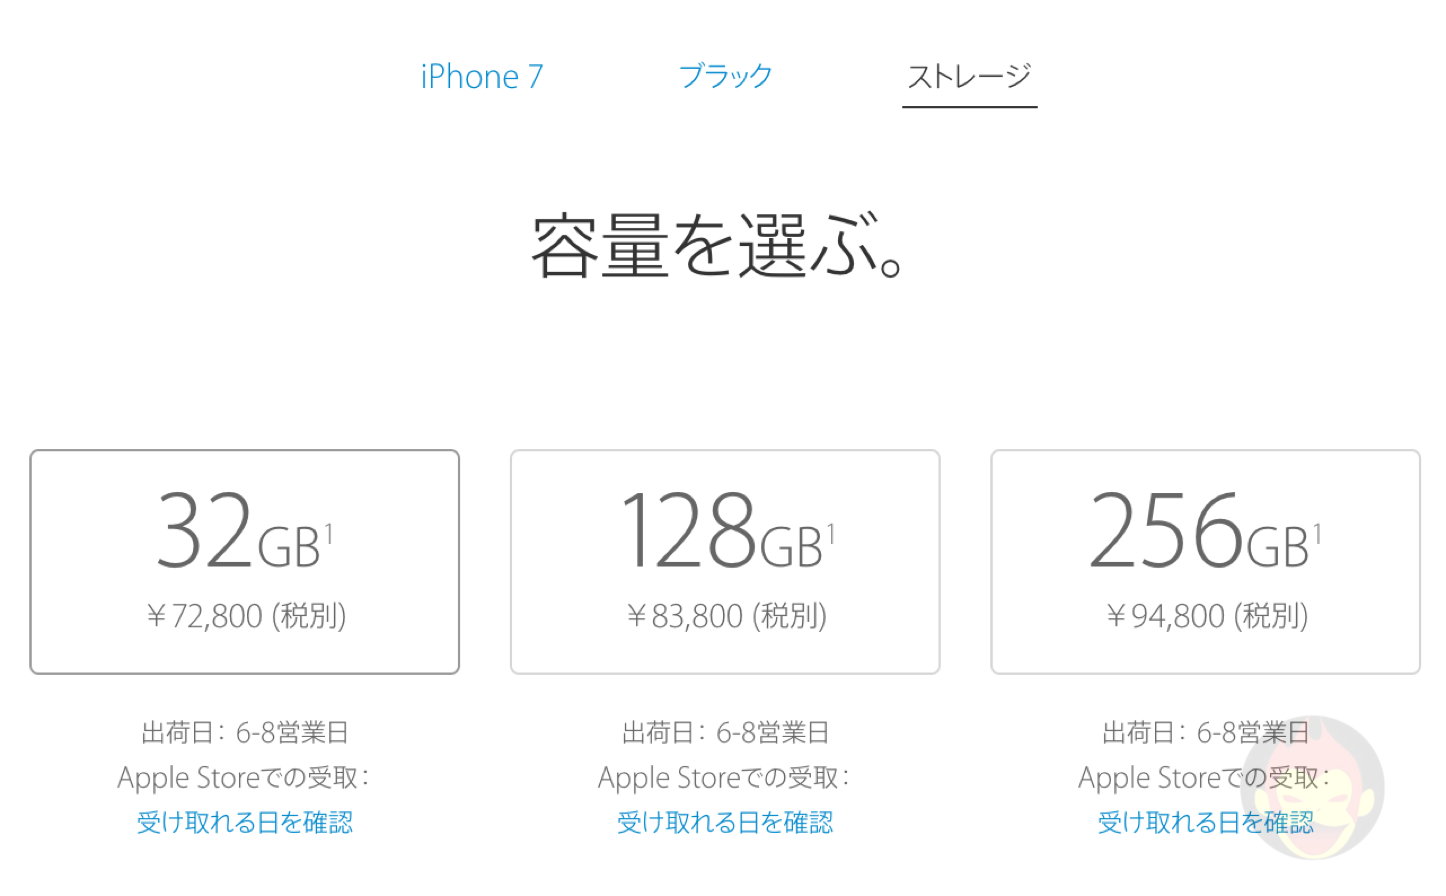 Iphone 7 stock is terrible